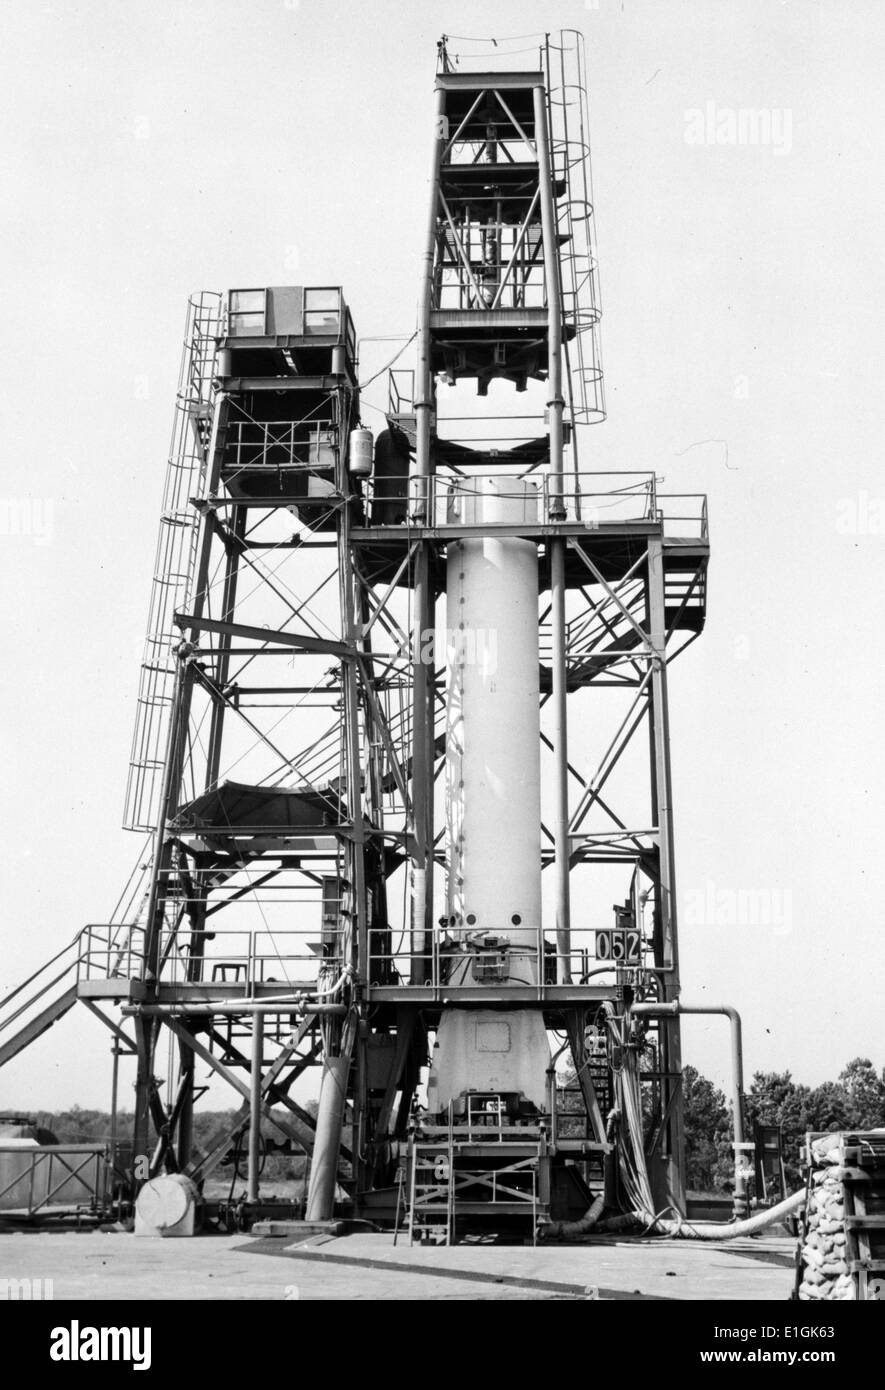 Marshall Space Flight Centre - Stock Image